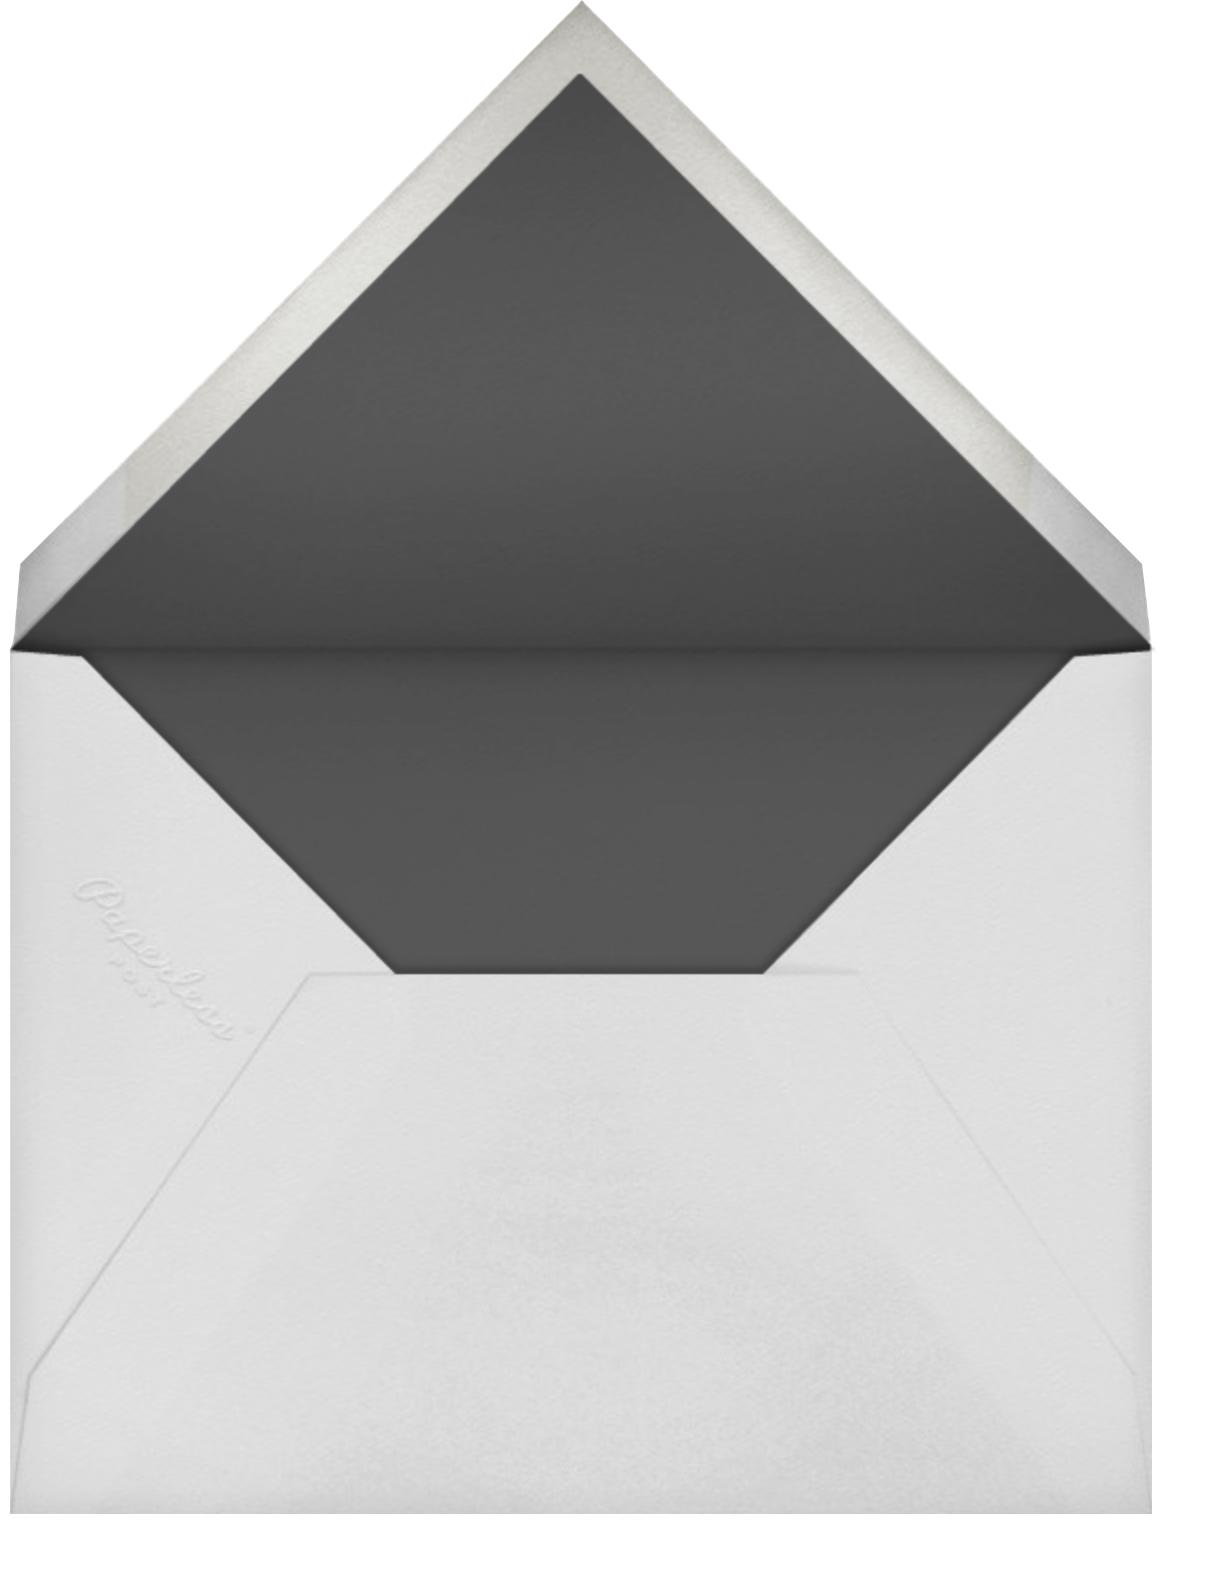 Starboard - Charcoal - Vera Wang - Envelope